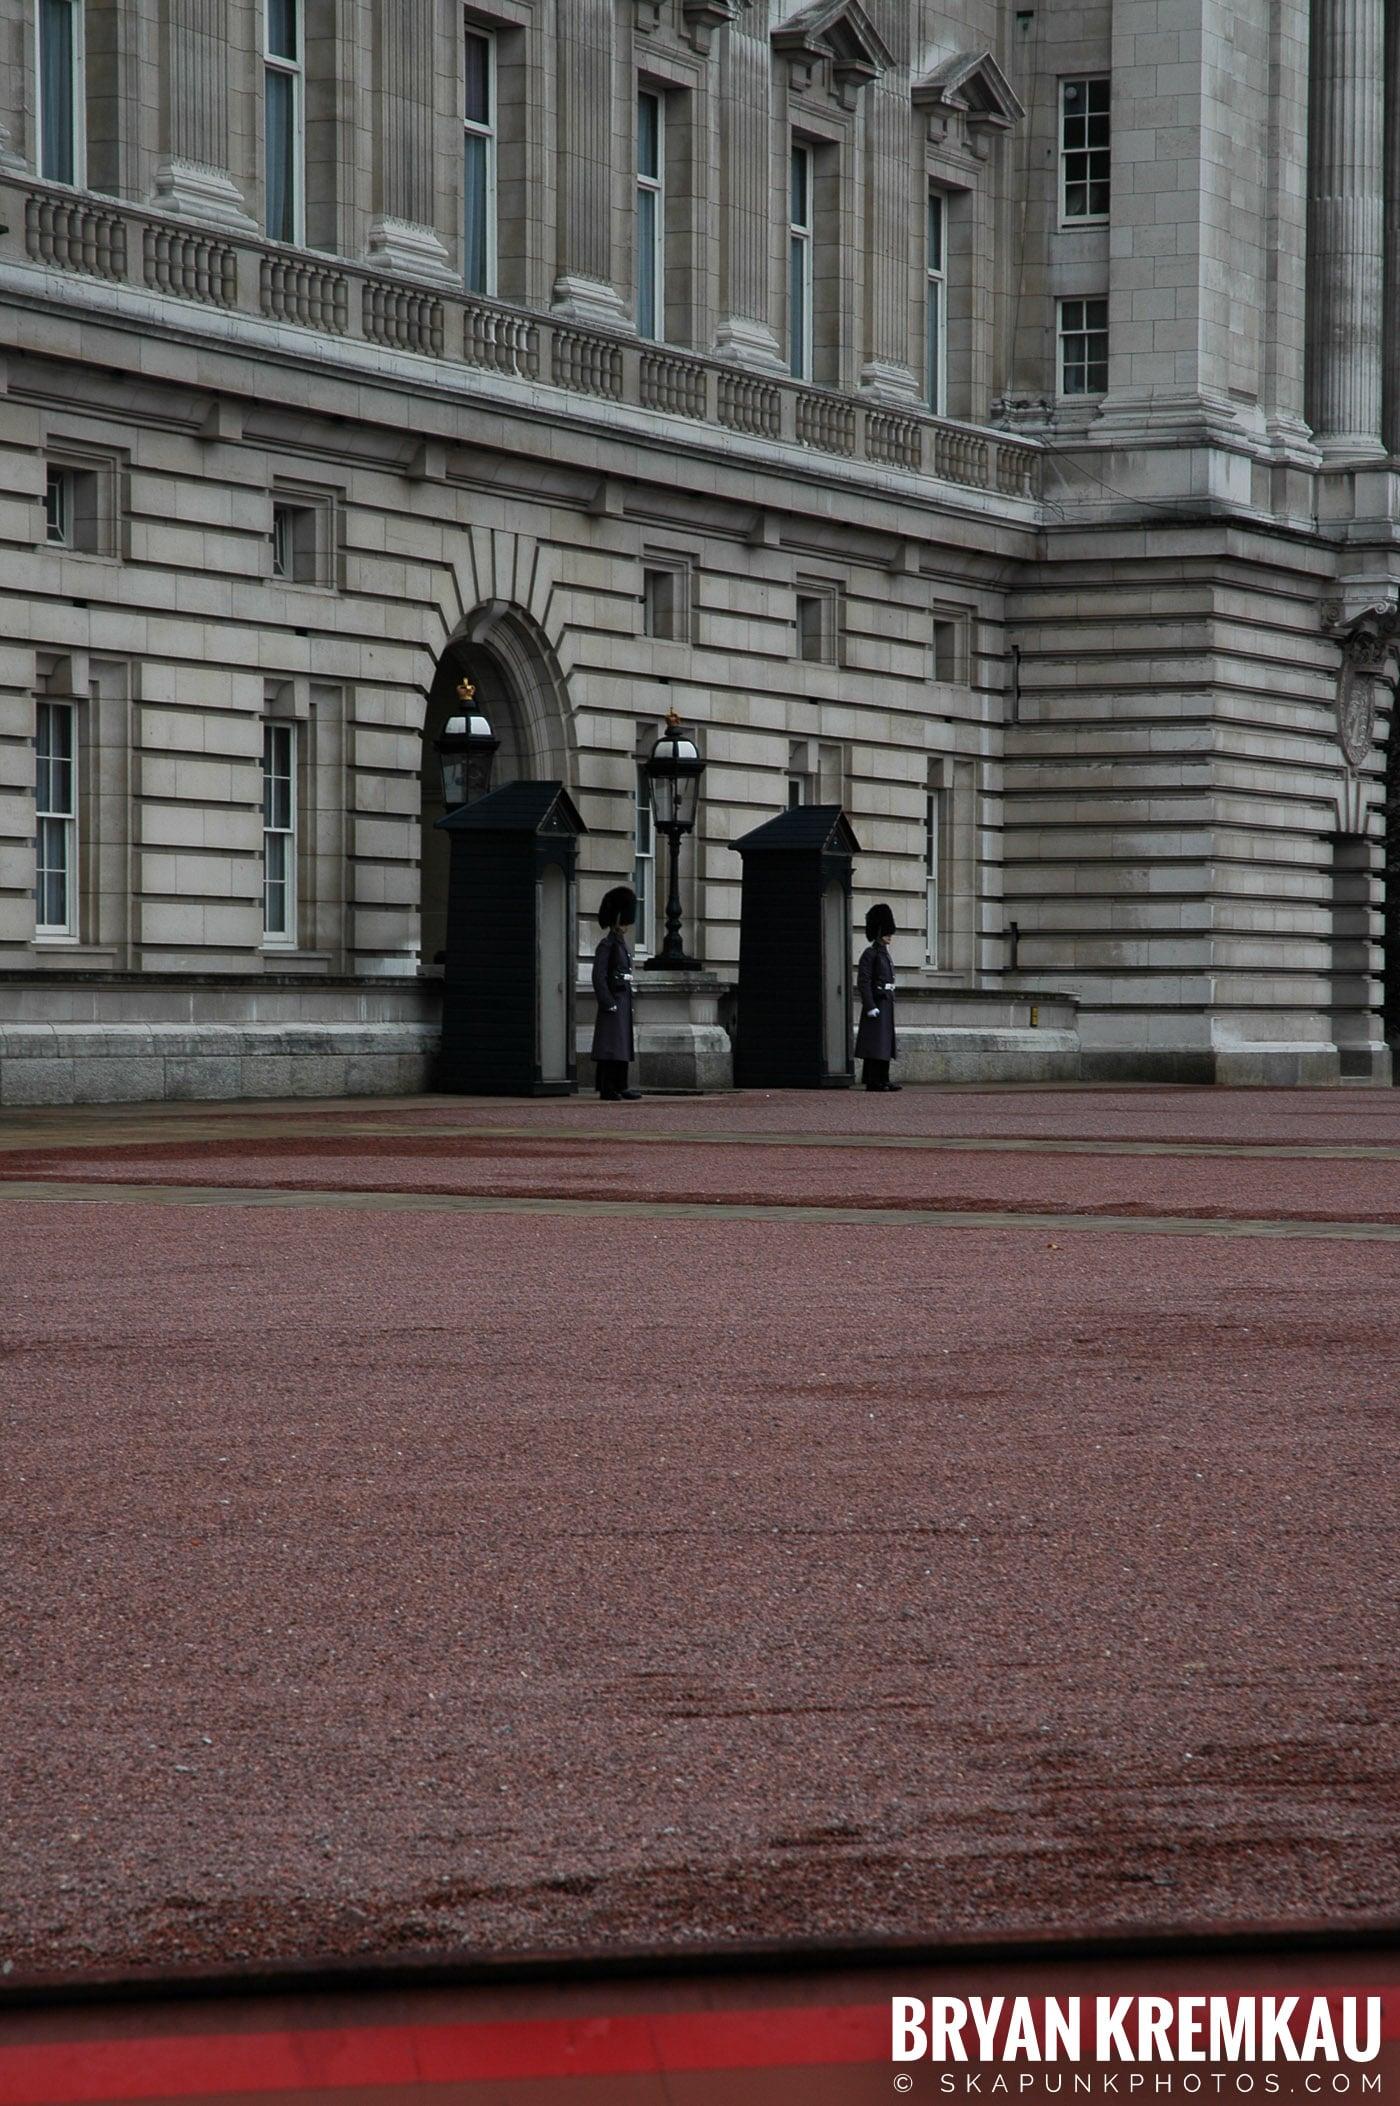 London, England - Day 5 - 12.20.05 (15)